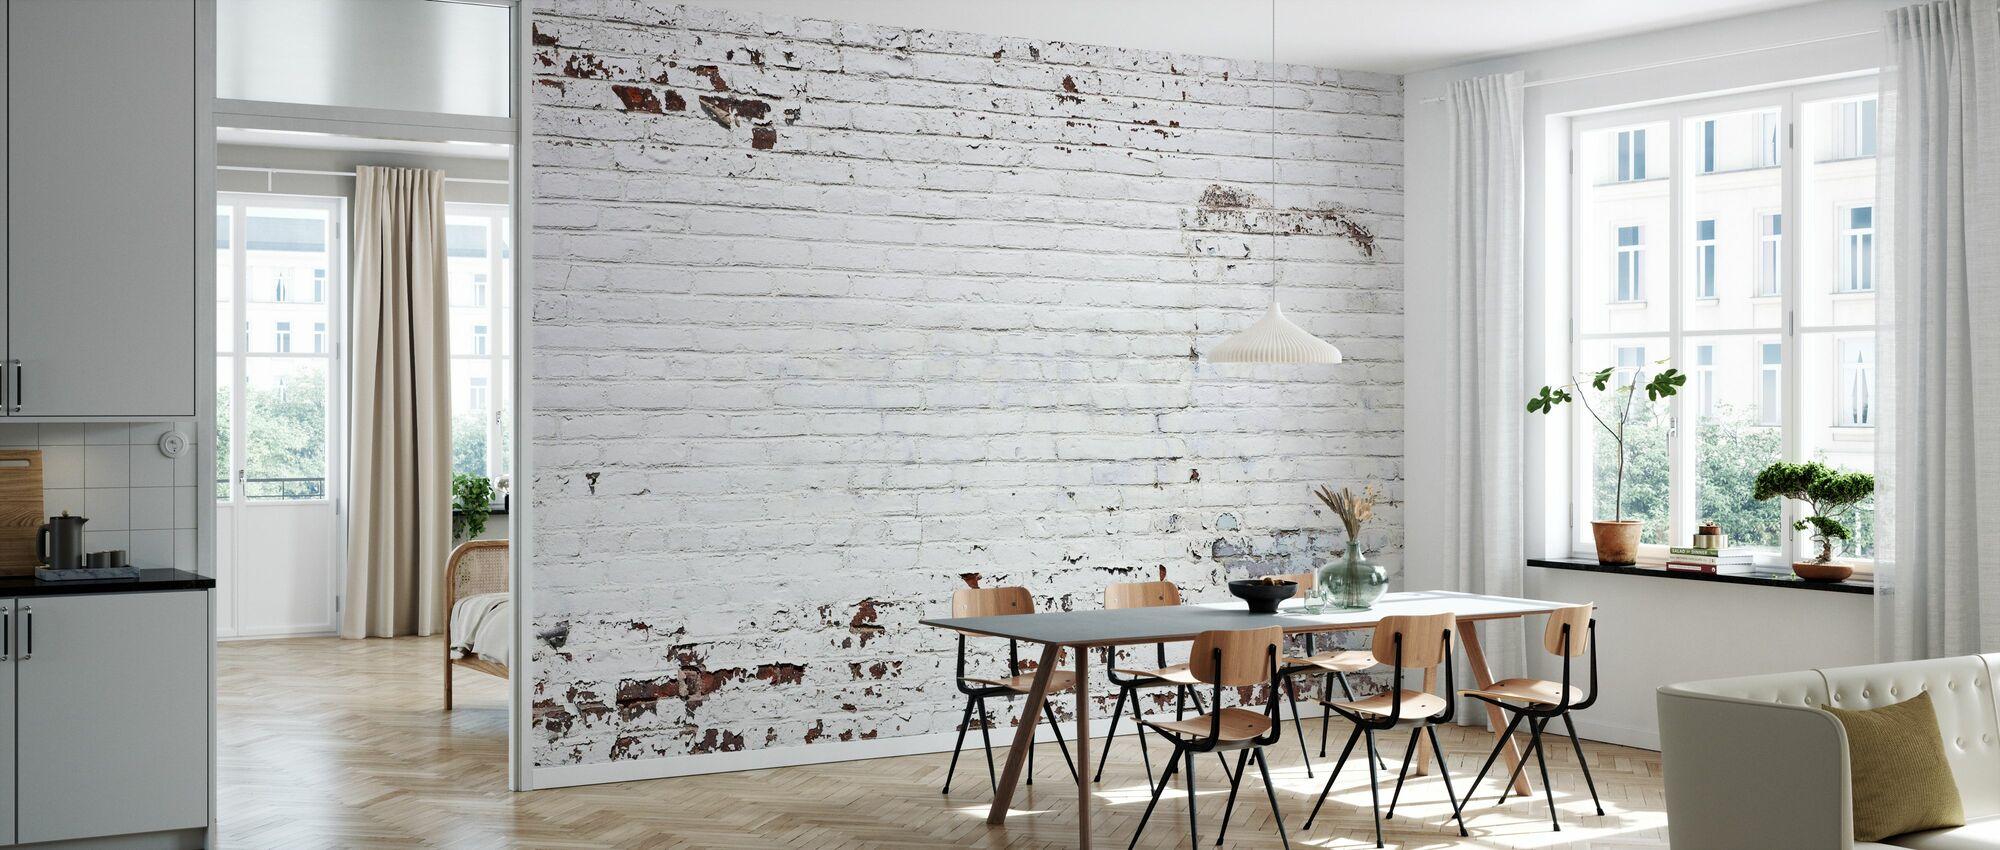 Muro de ladrillo antiguo - Papel pintado - Cocina